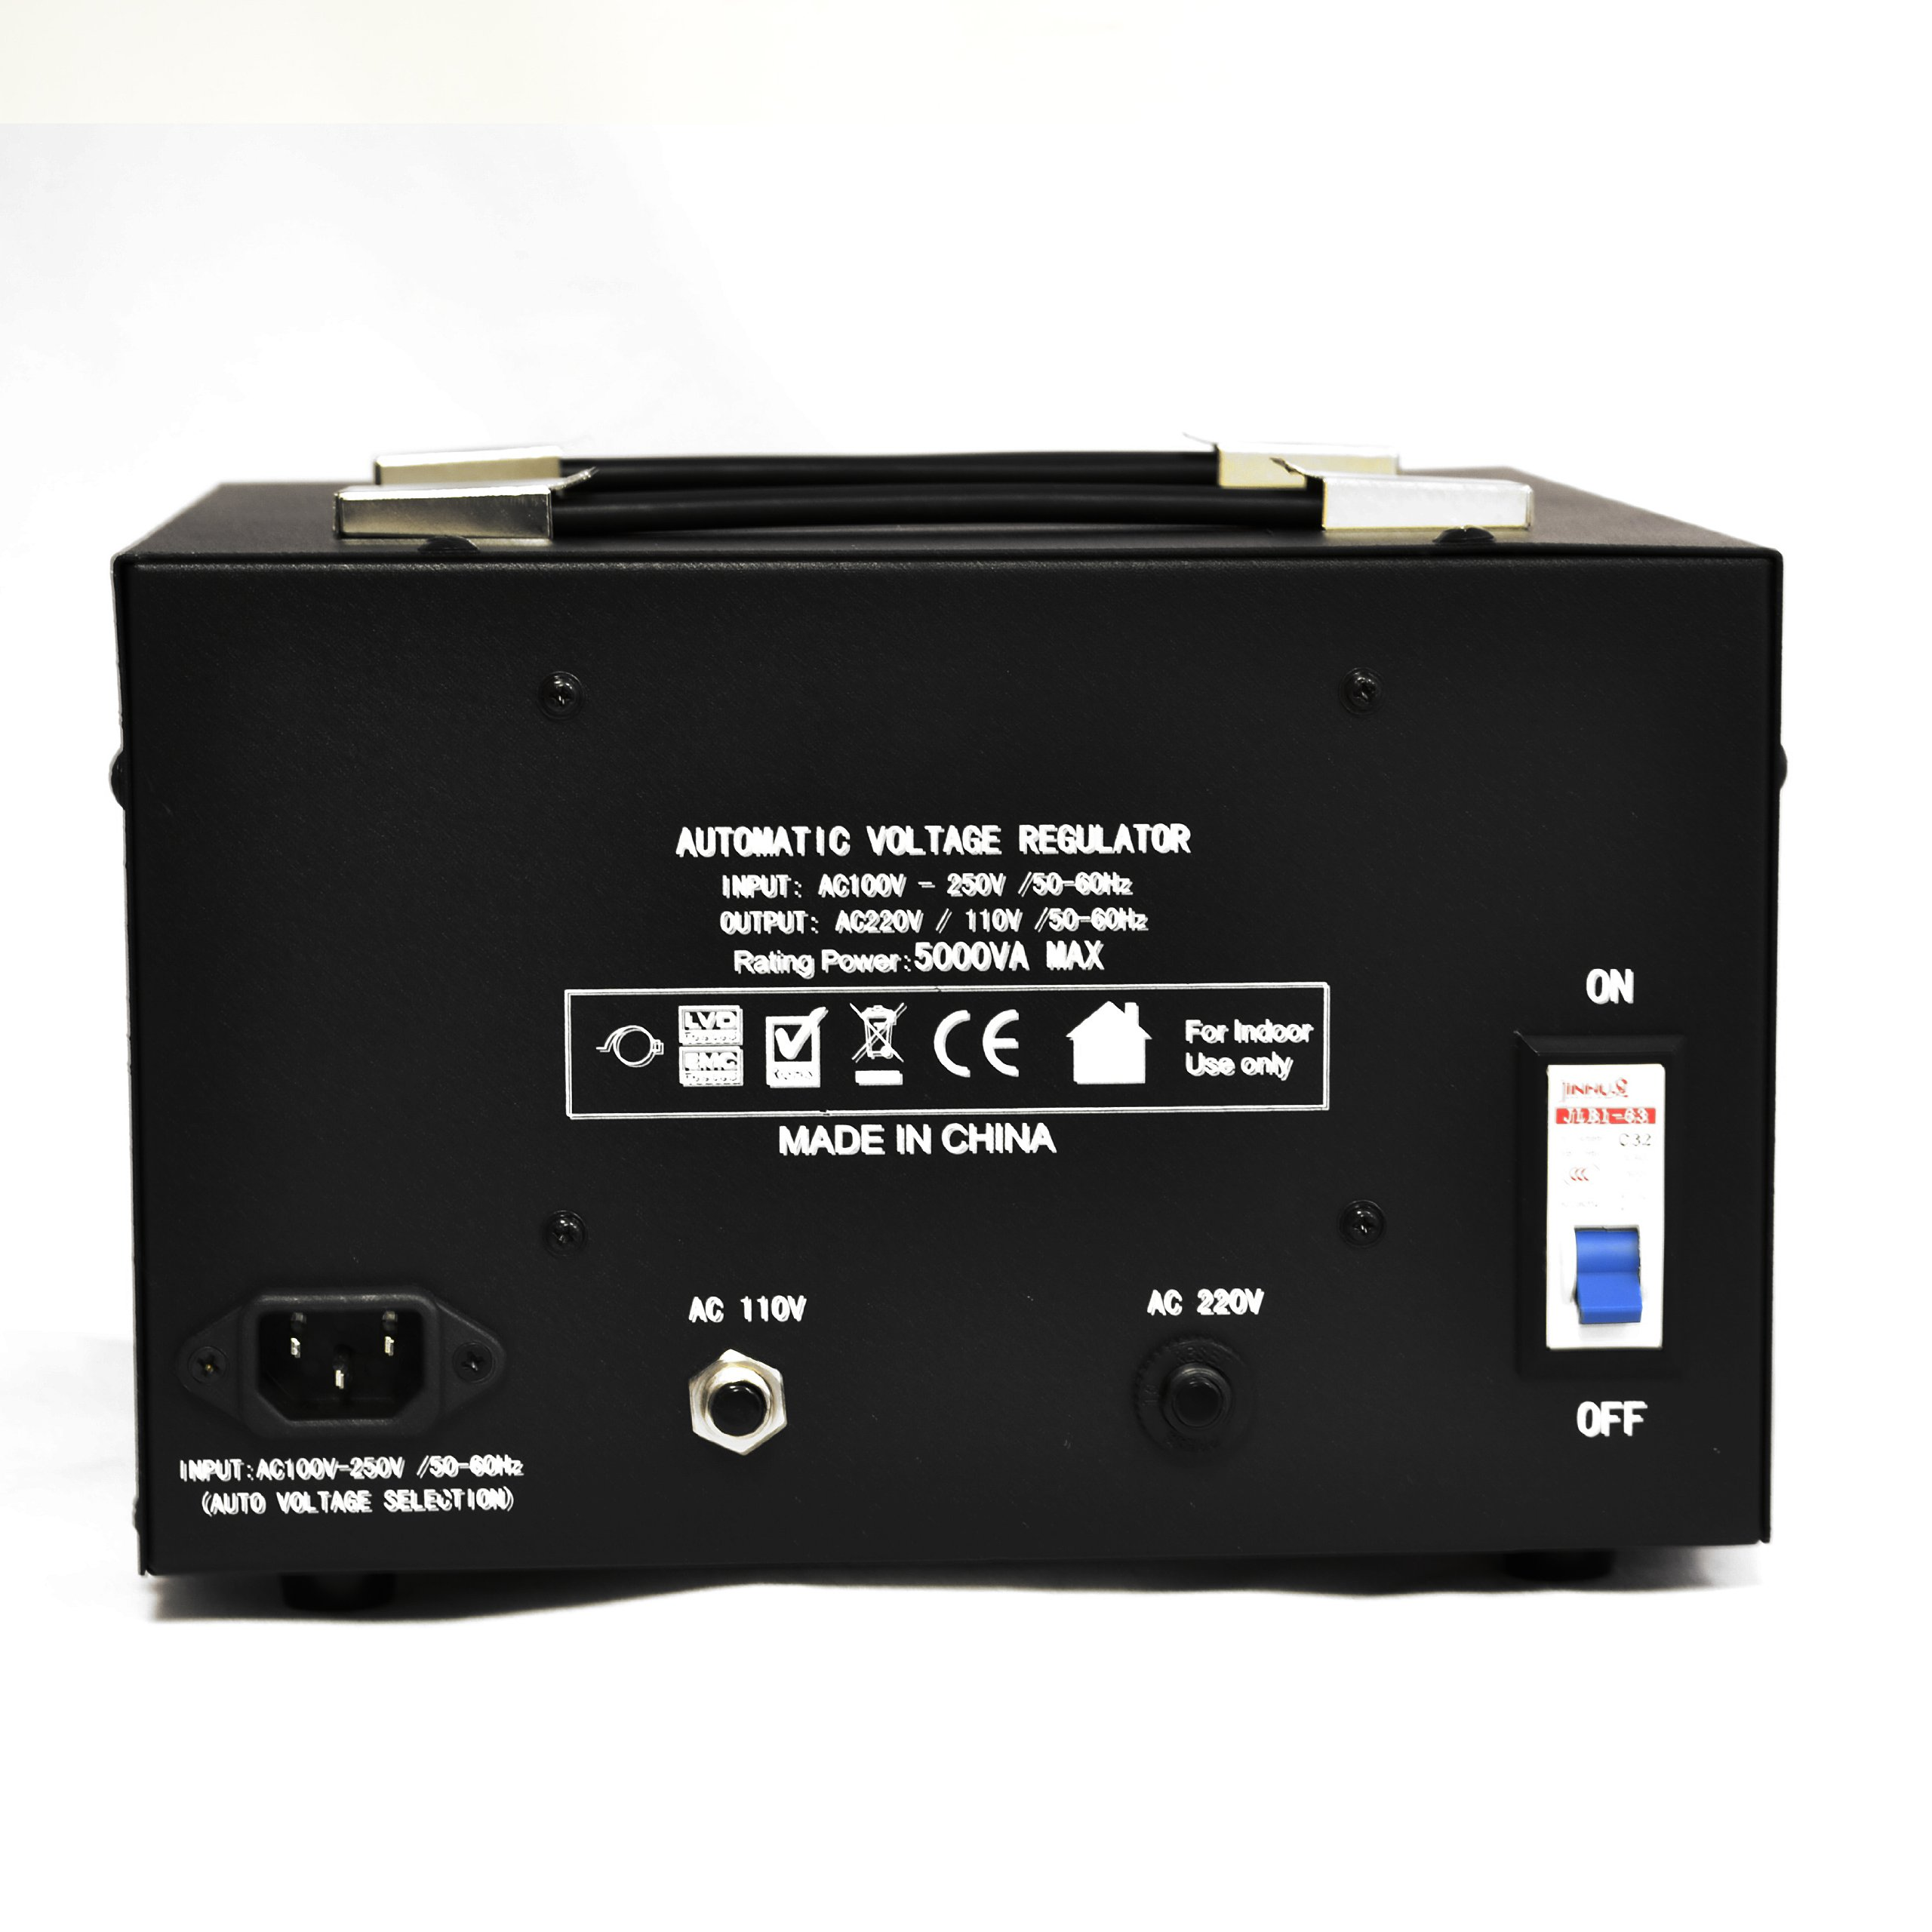 LiteFuze 5000 Watt Voltage Converter Transformer Heavy Duty Regulator Meter - Step Up/Down - 110/120/220/240 Volt - Fully Grounded Cord - Universal Output Sockets by LiteFuze (Image #2)